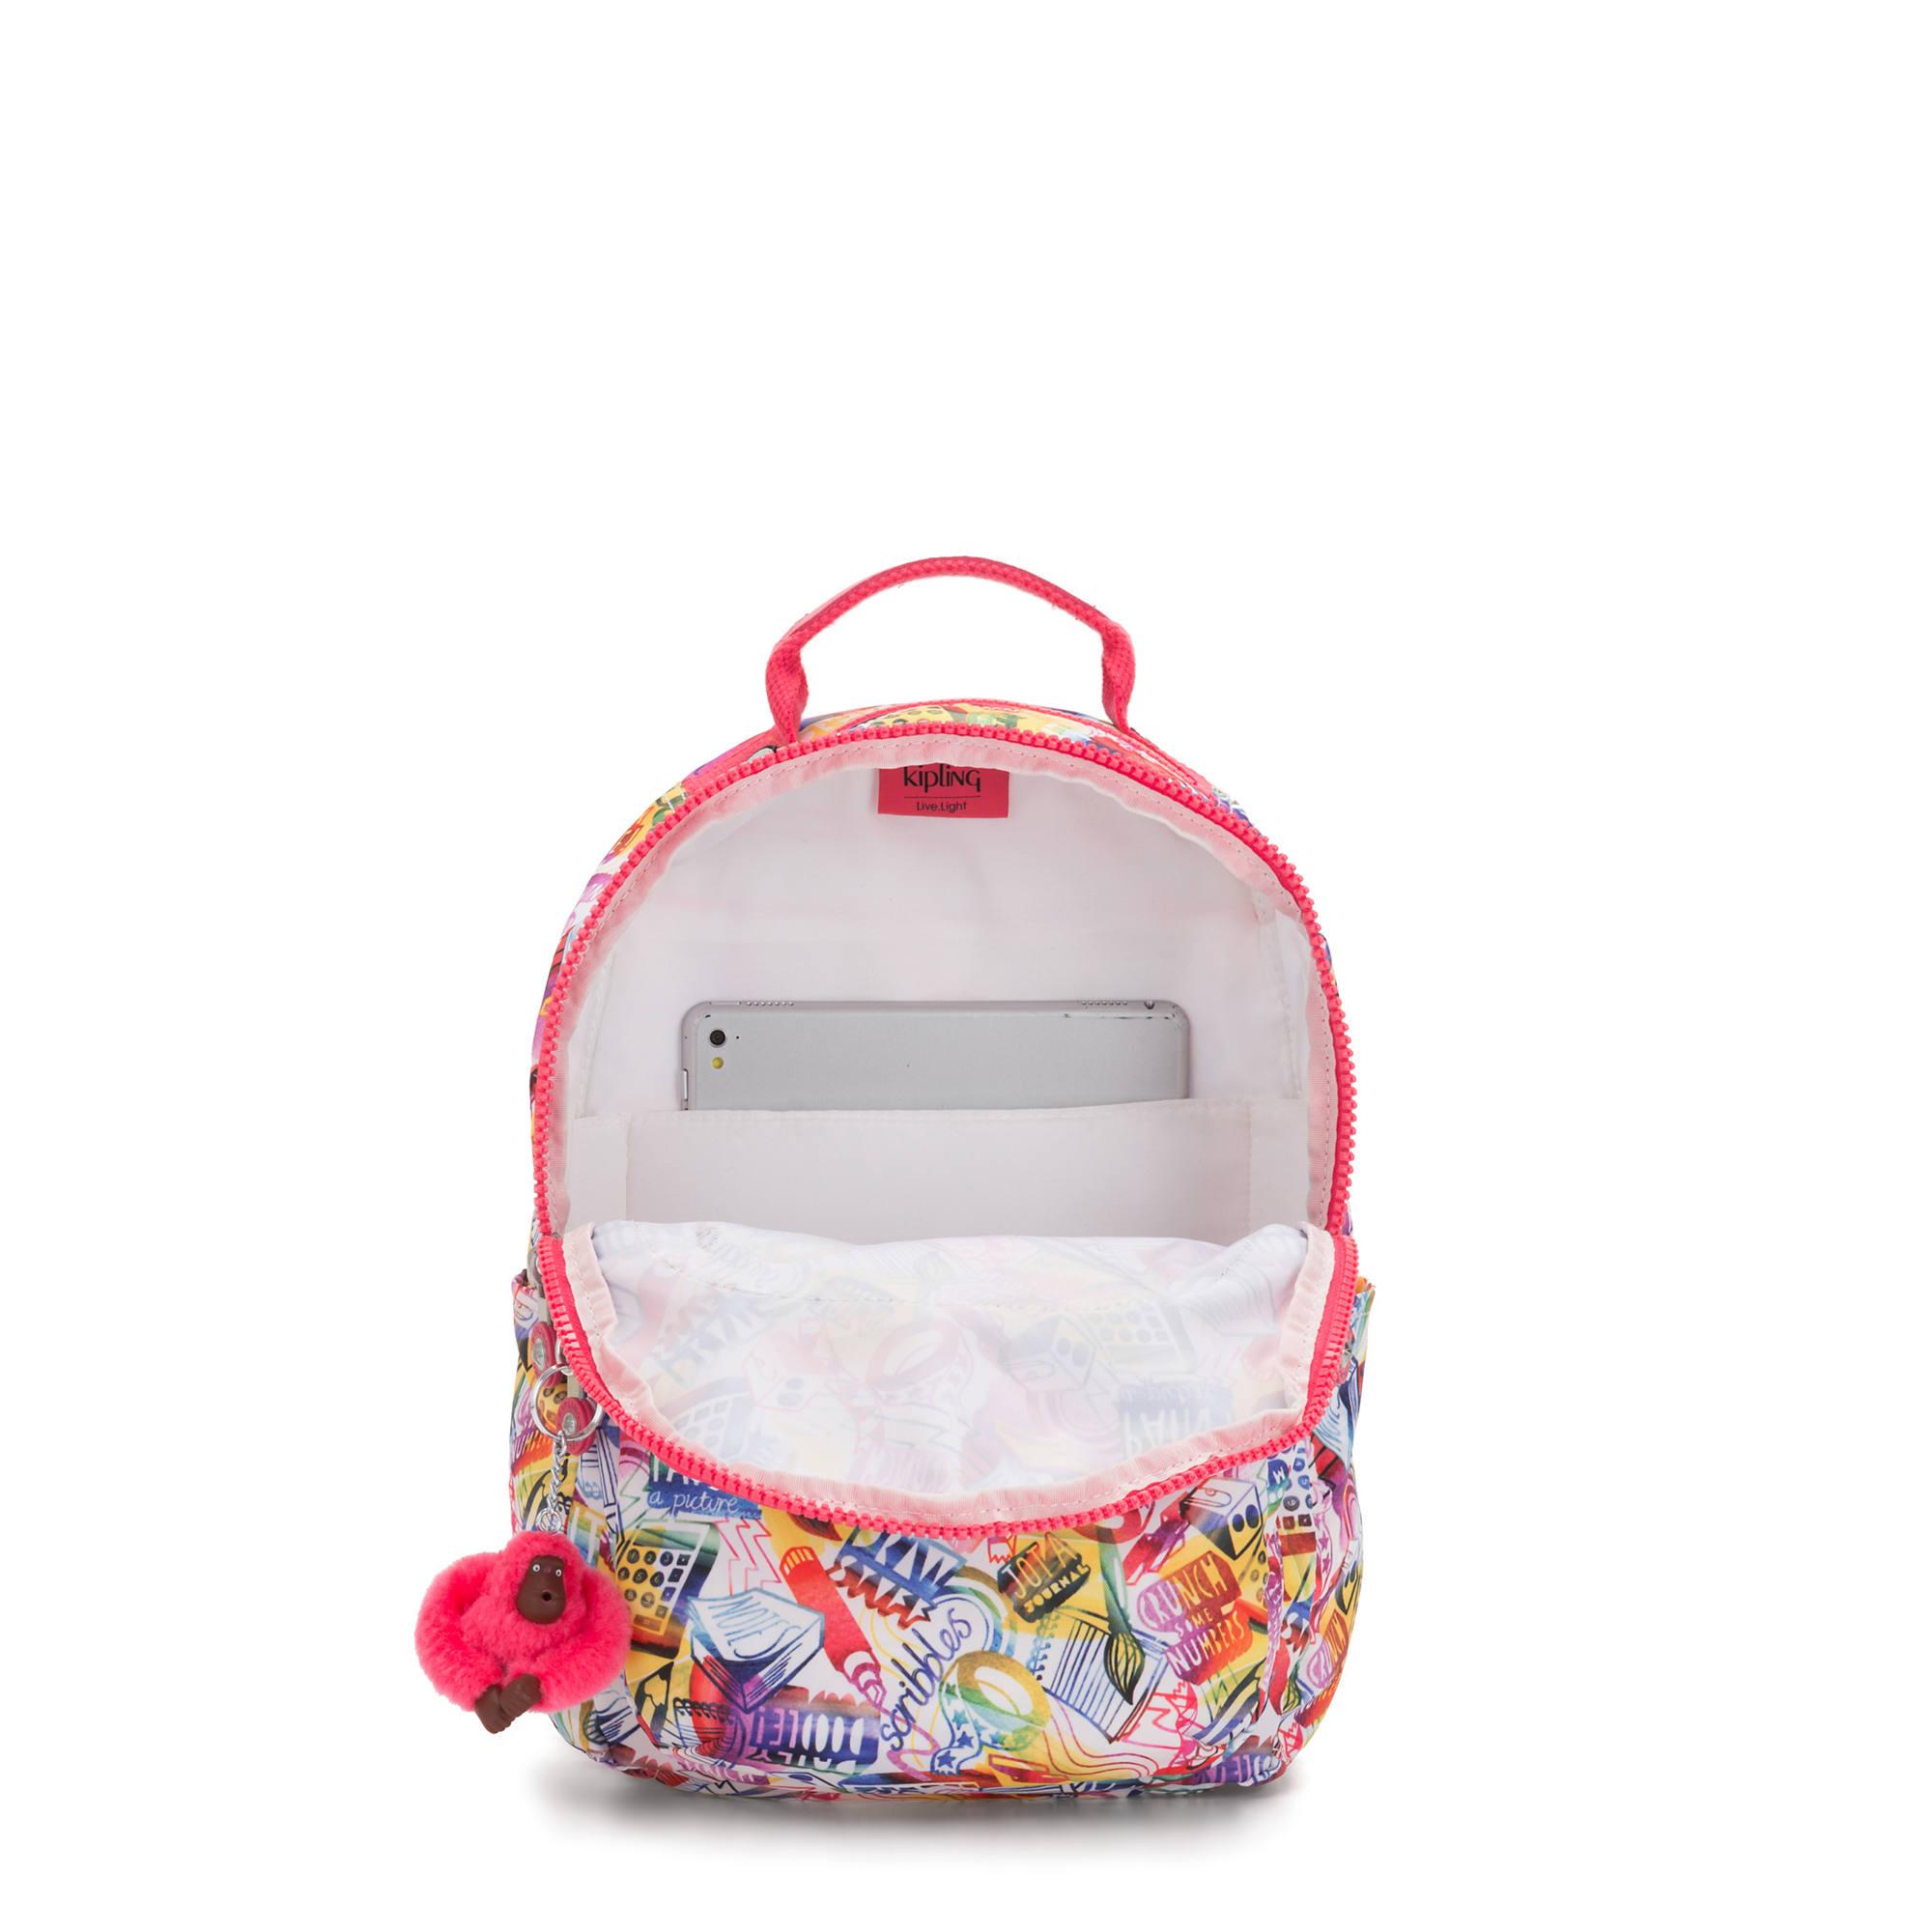 Kipling-Seoul-Small-11-034-Laptop-Backpack thumbnail 27